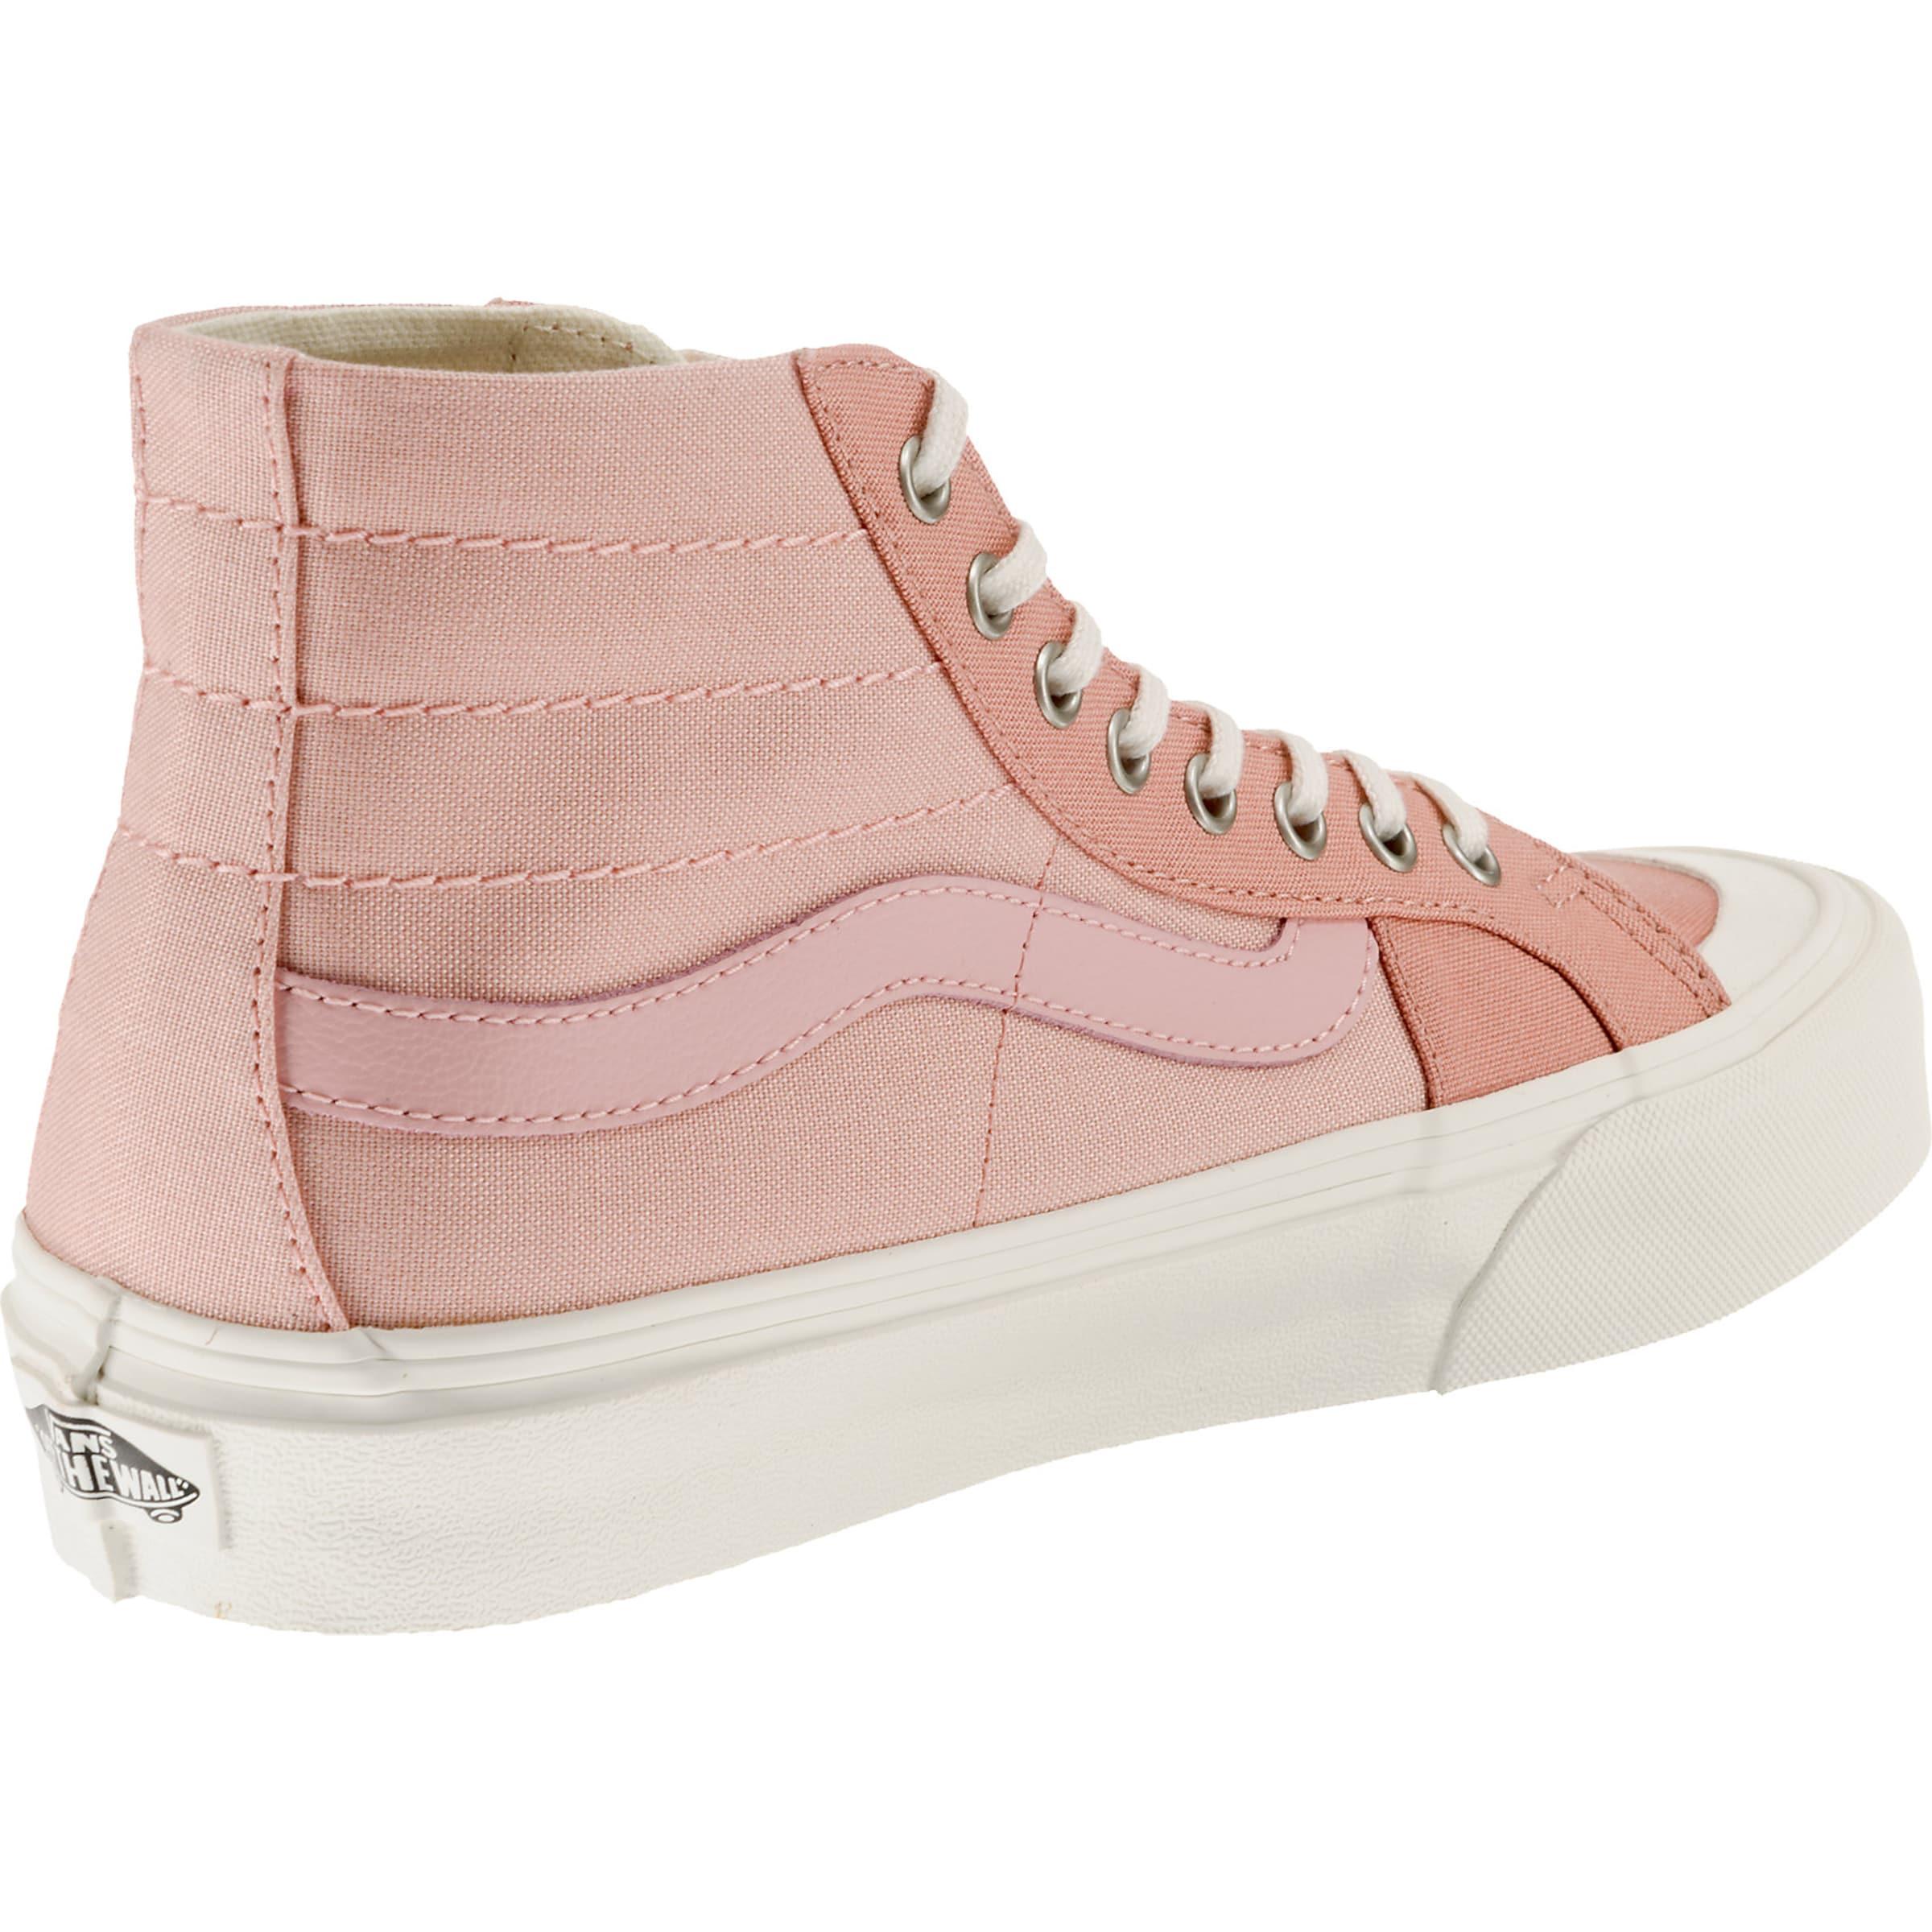 Rosa 'ua 138' In Vans Sk8 Sneakers hi thQdrCs